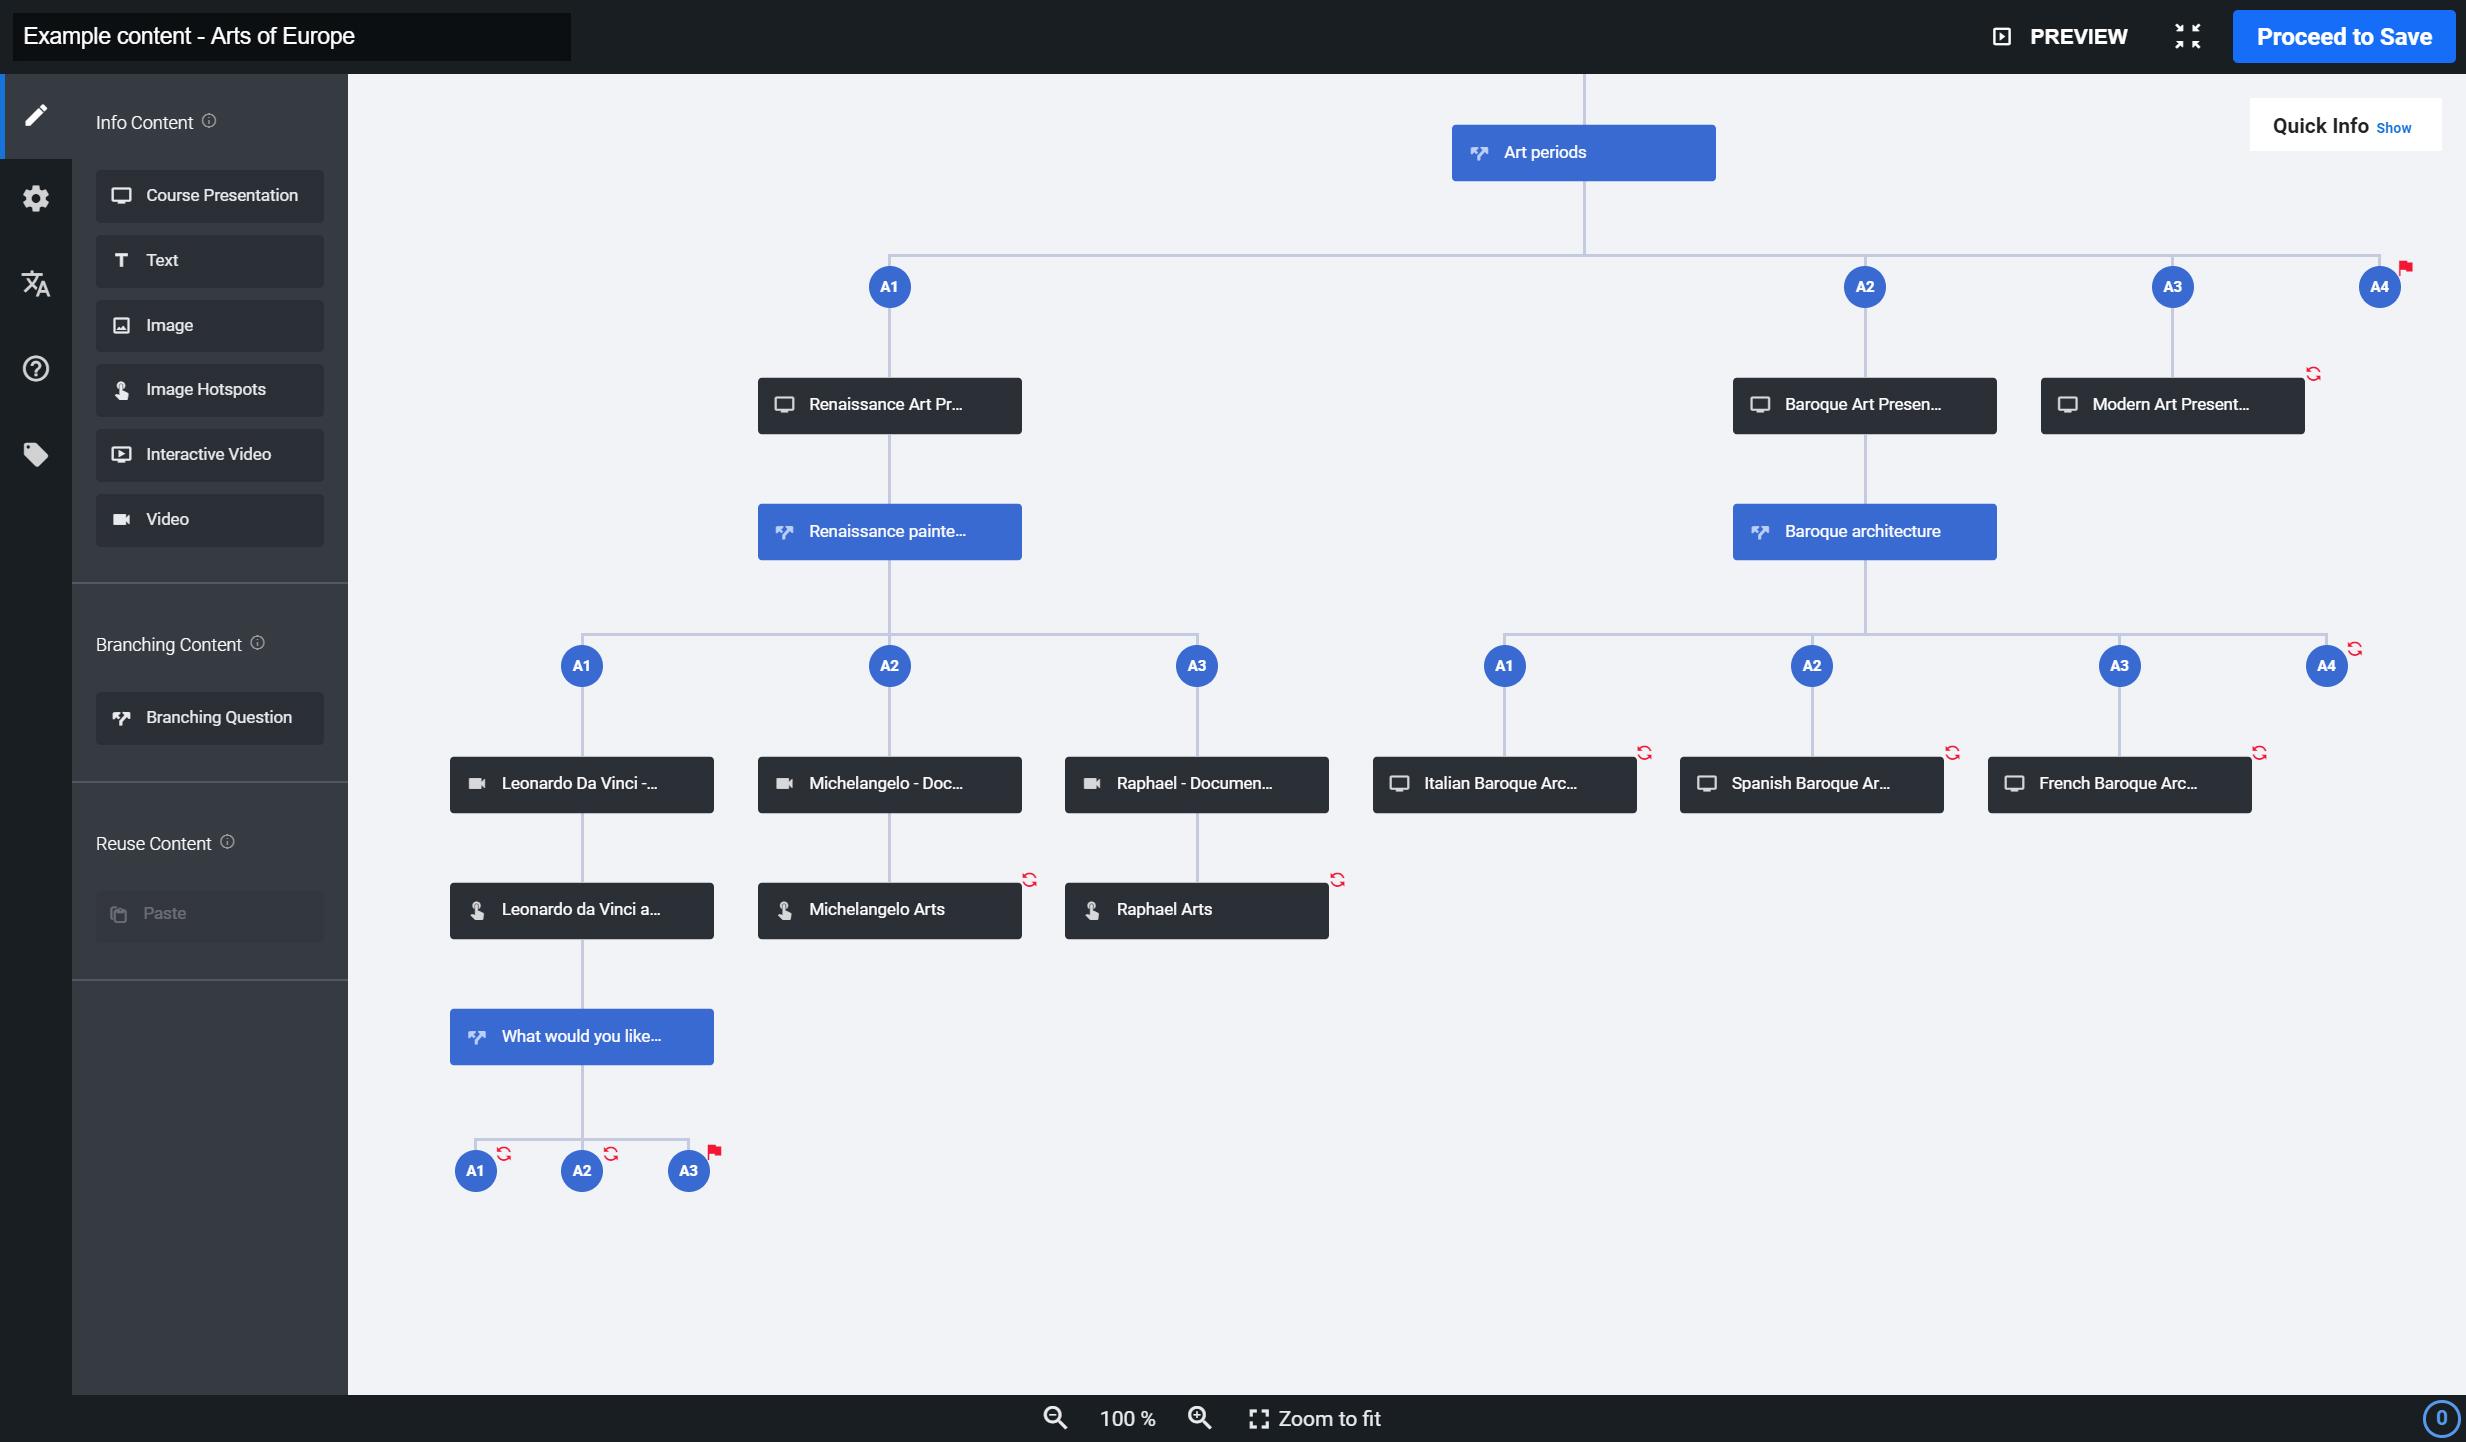 Branching scenario in a full-screen mode